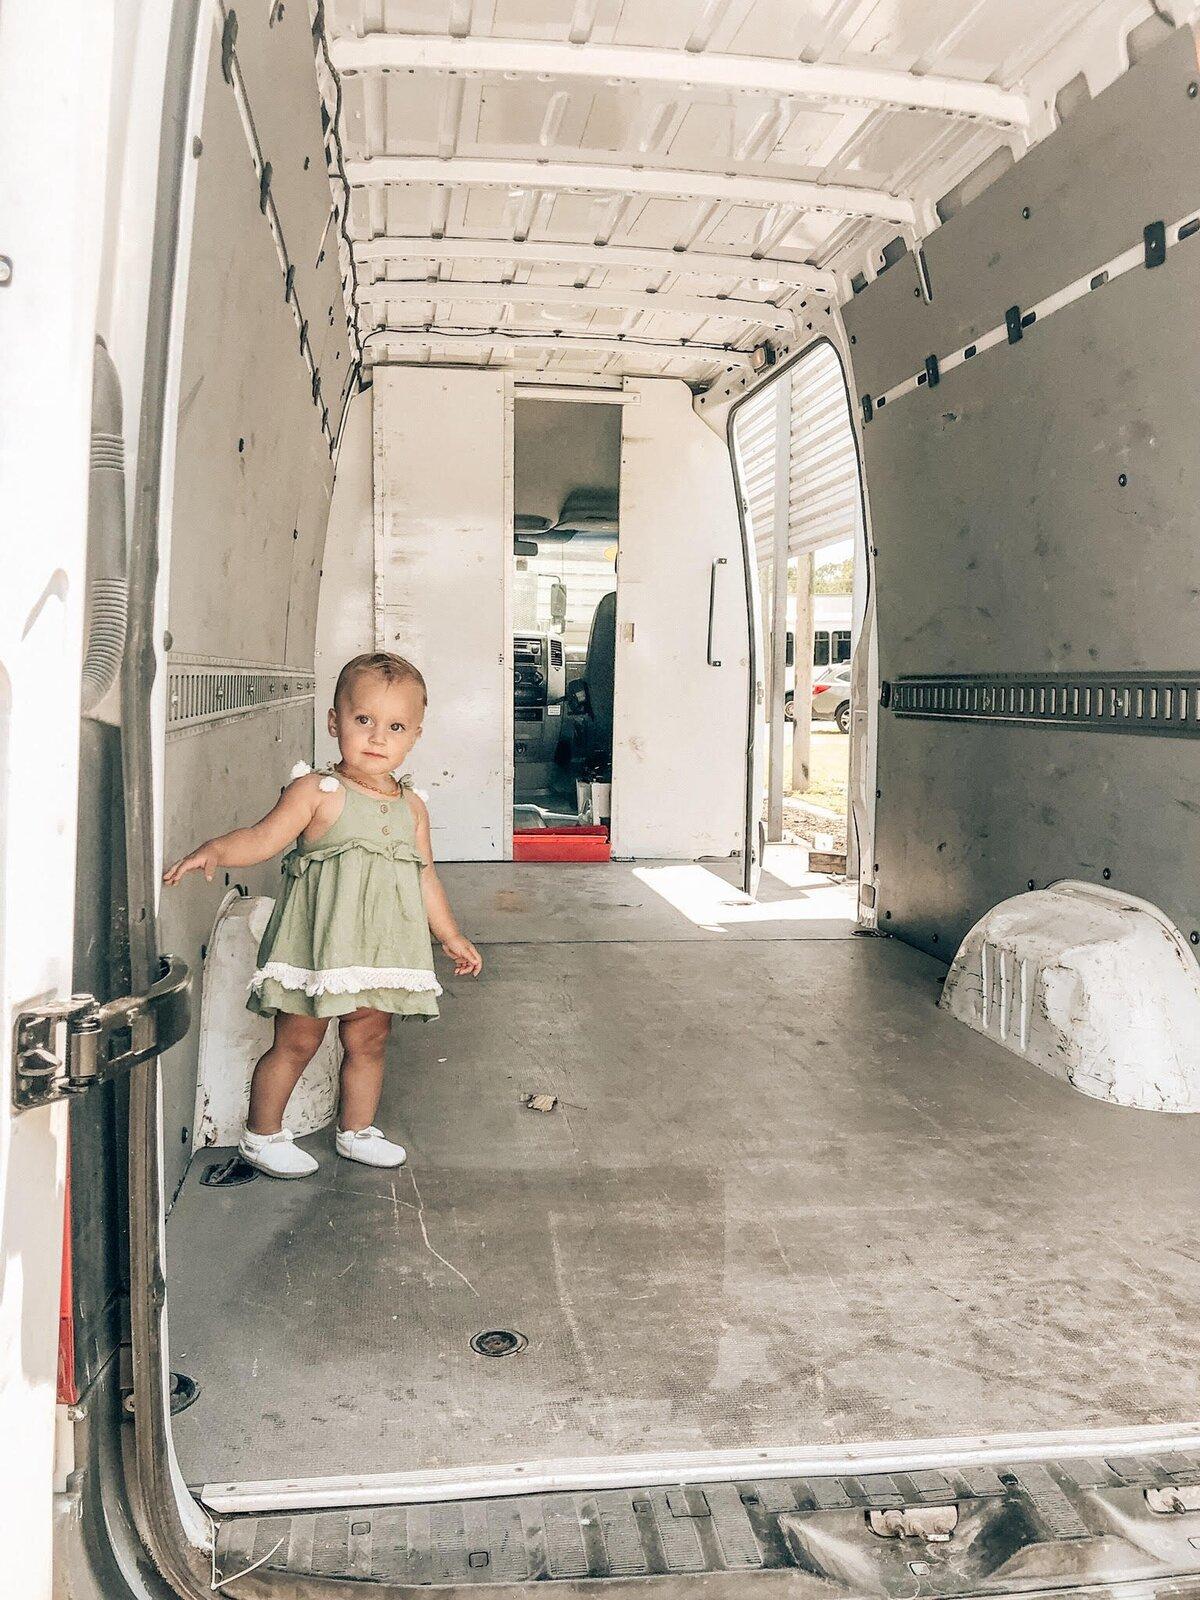 Vanessa the Van gutted interior with Luna